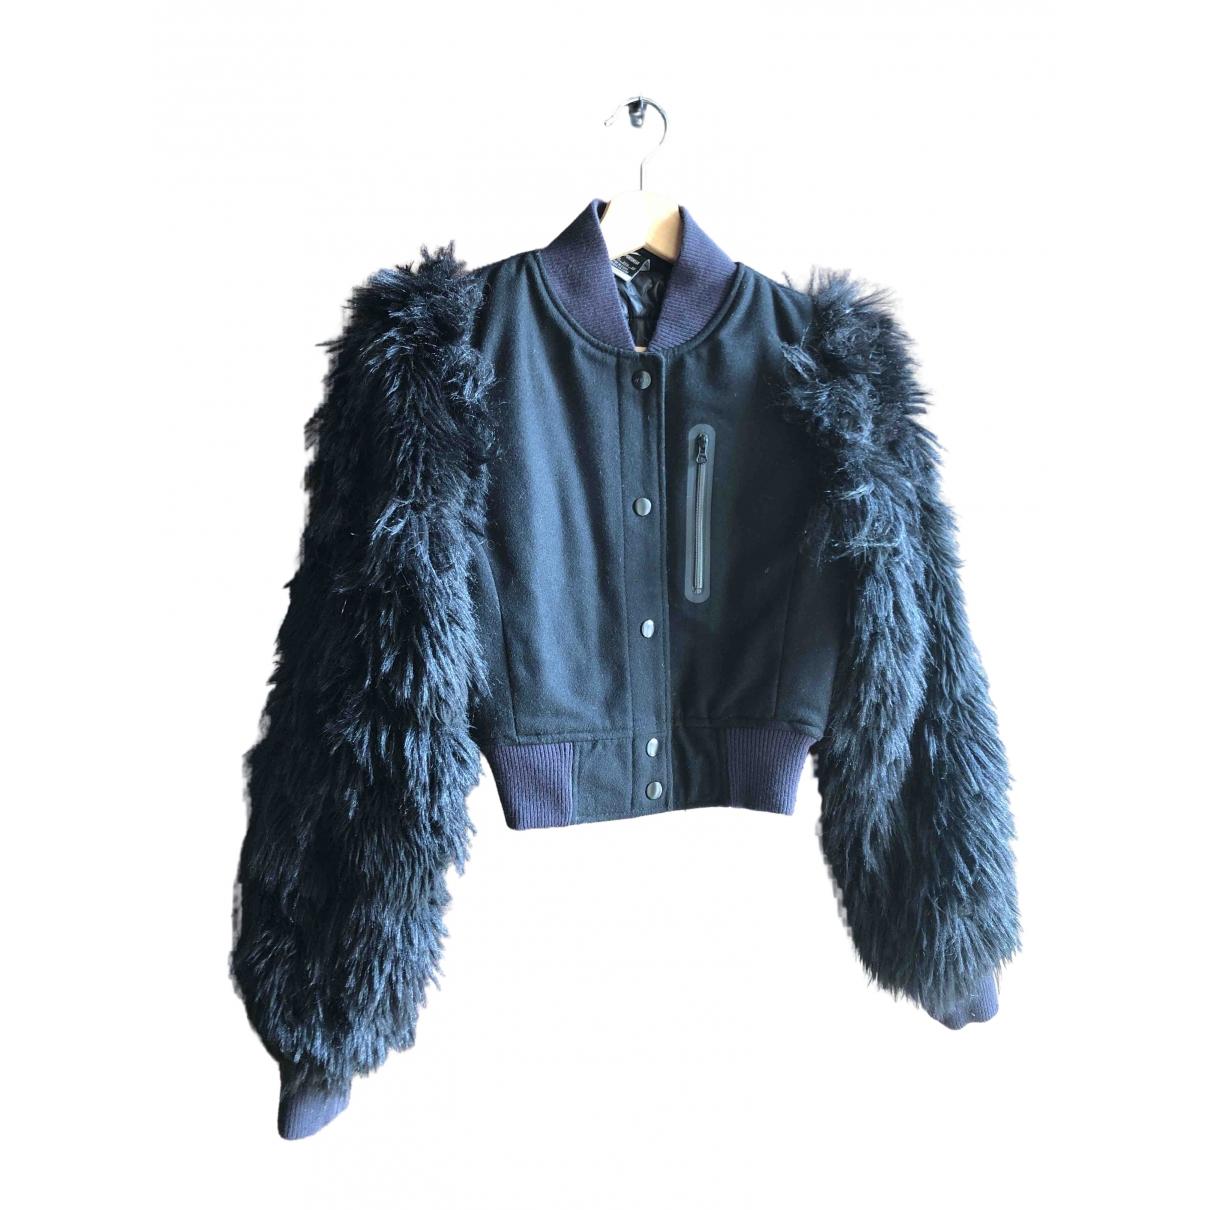 Nike \N Black jacket for Women XS International